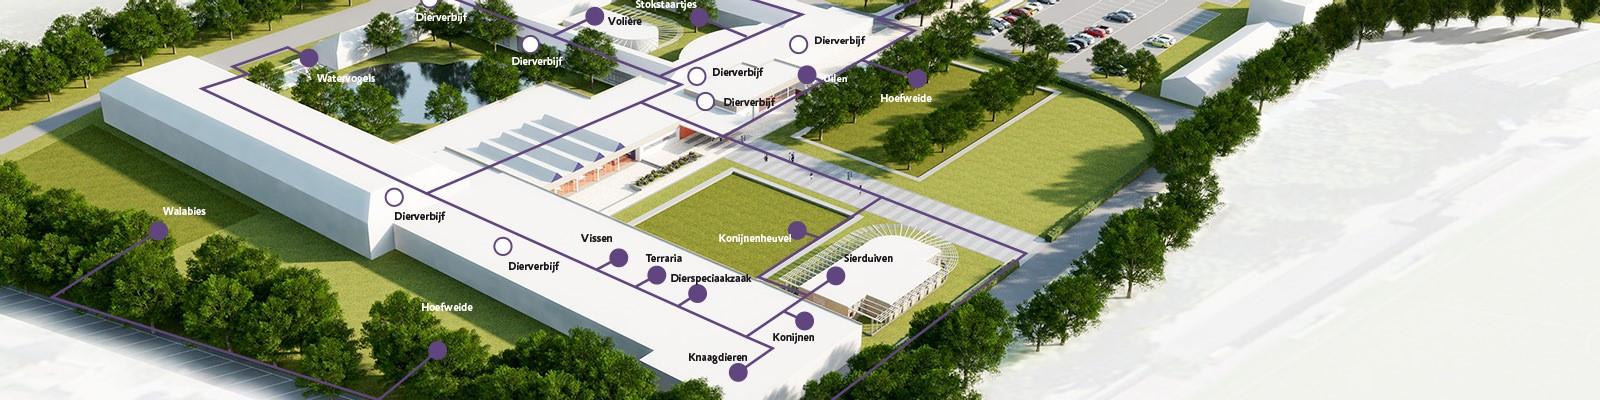 Plattegrond Campus Aeres MBO Barneveld